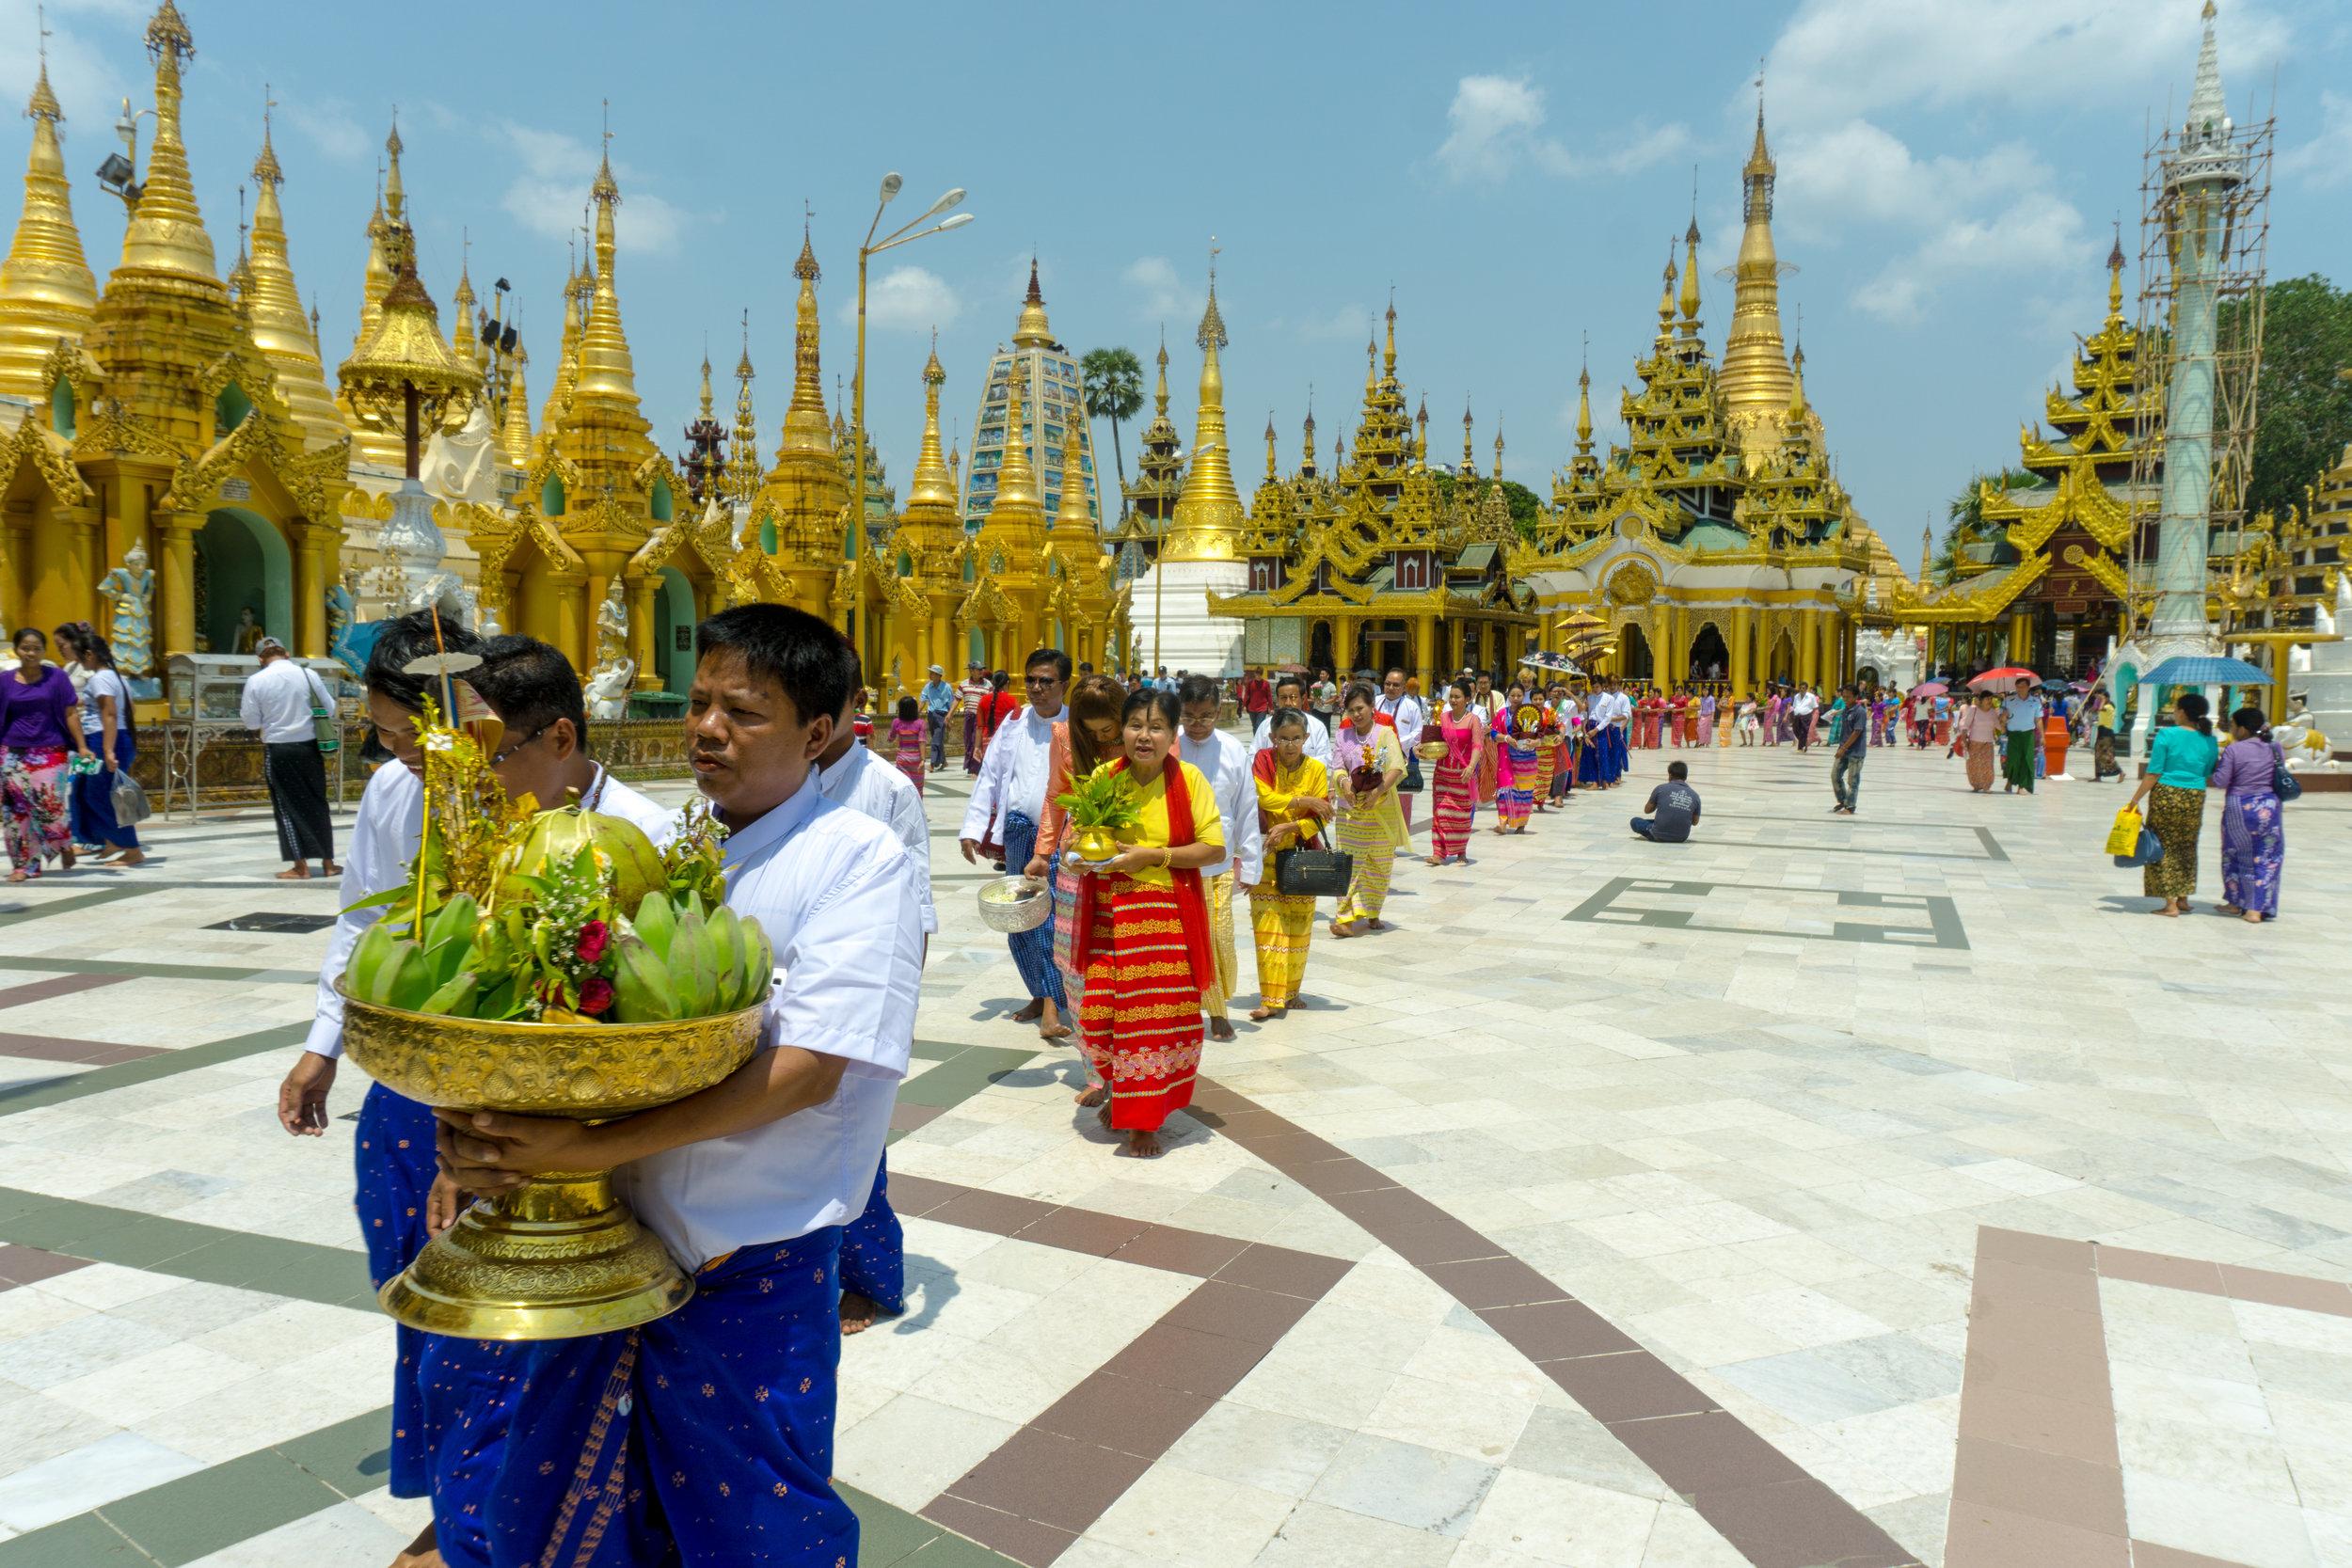 Wedding ceremony at Shwedagon